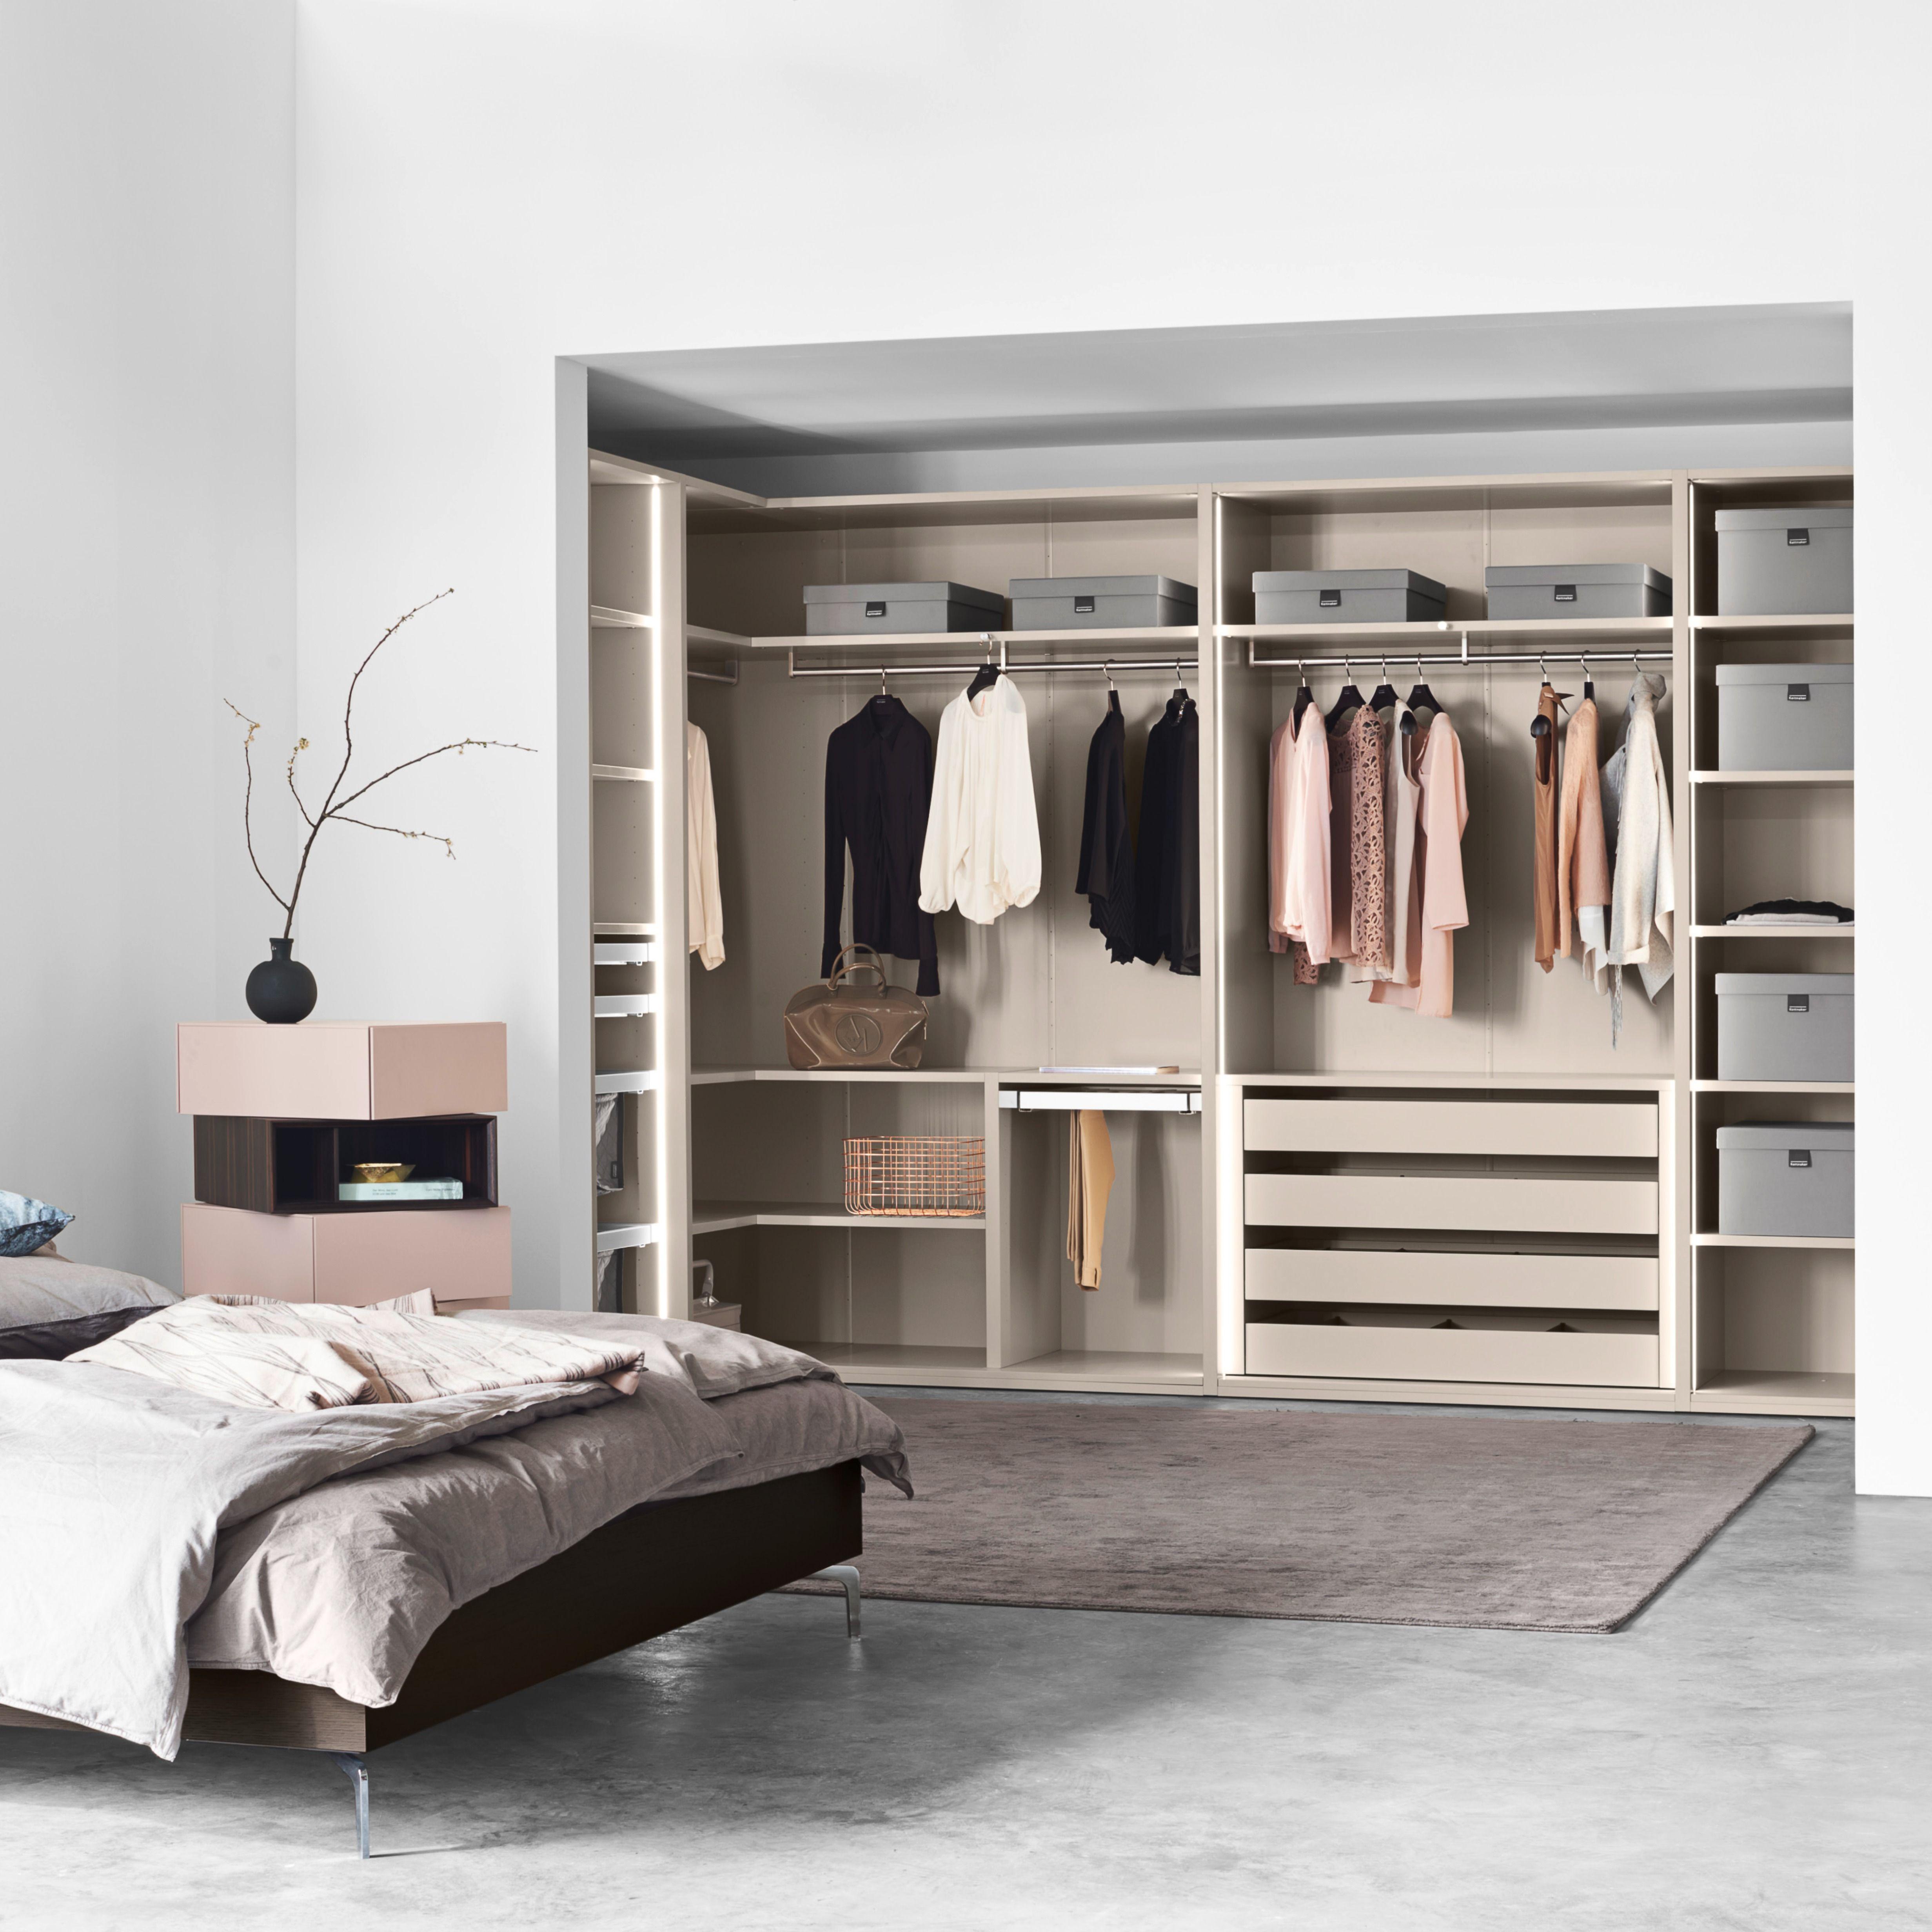 Open Wardrobe Open Wardrobe Kitchen Design Companies Wadrobe Design